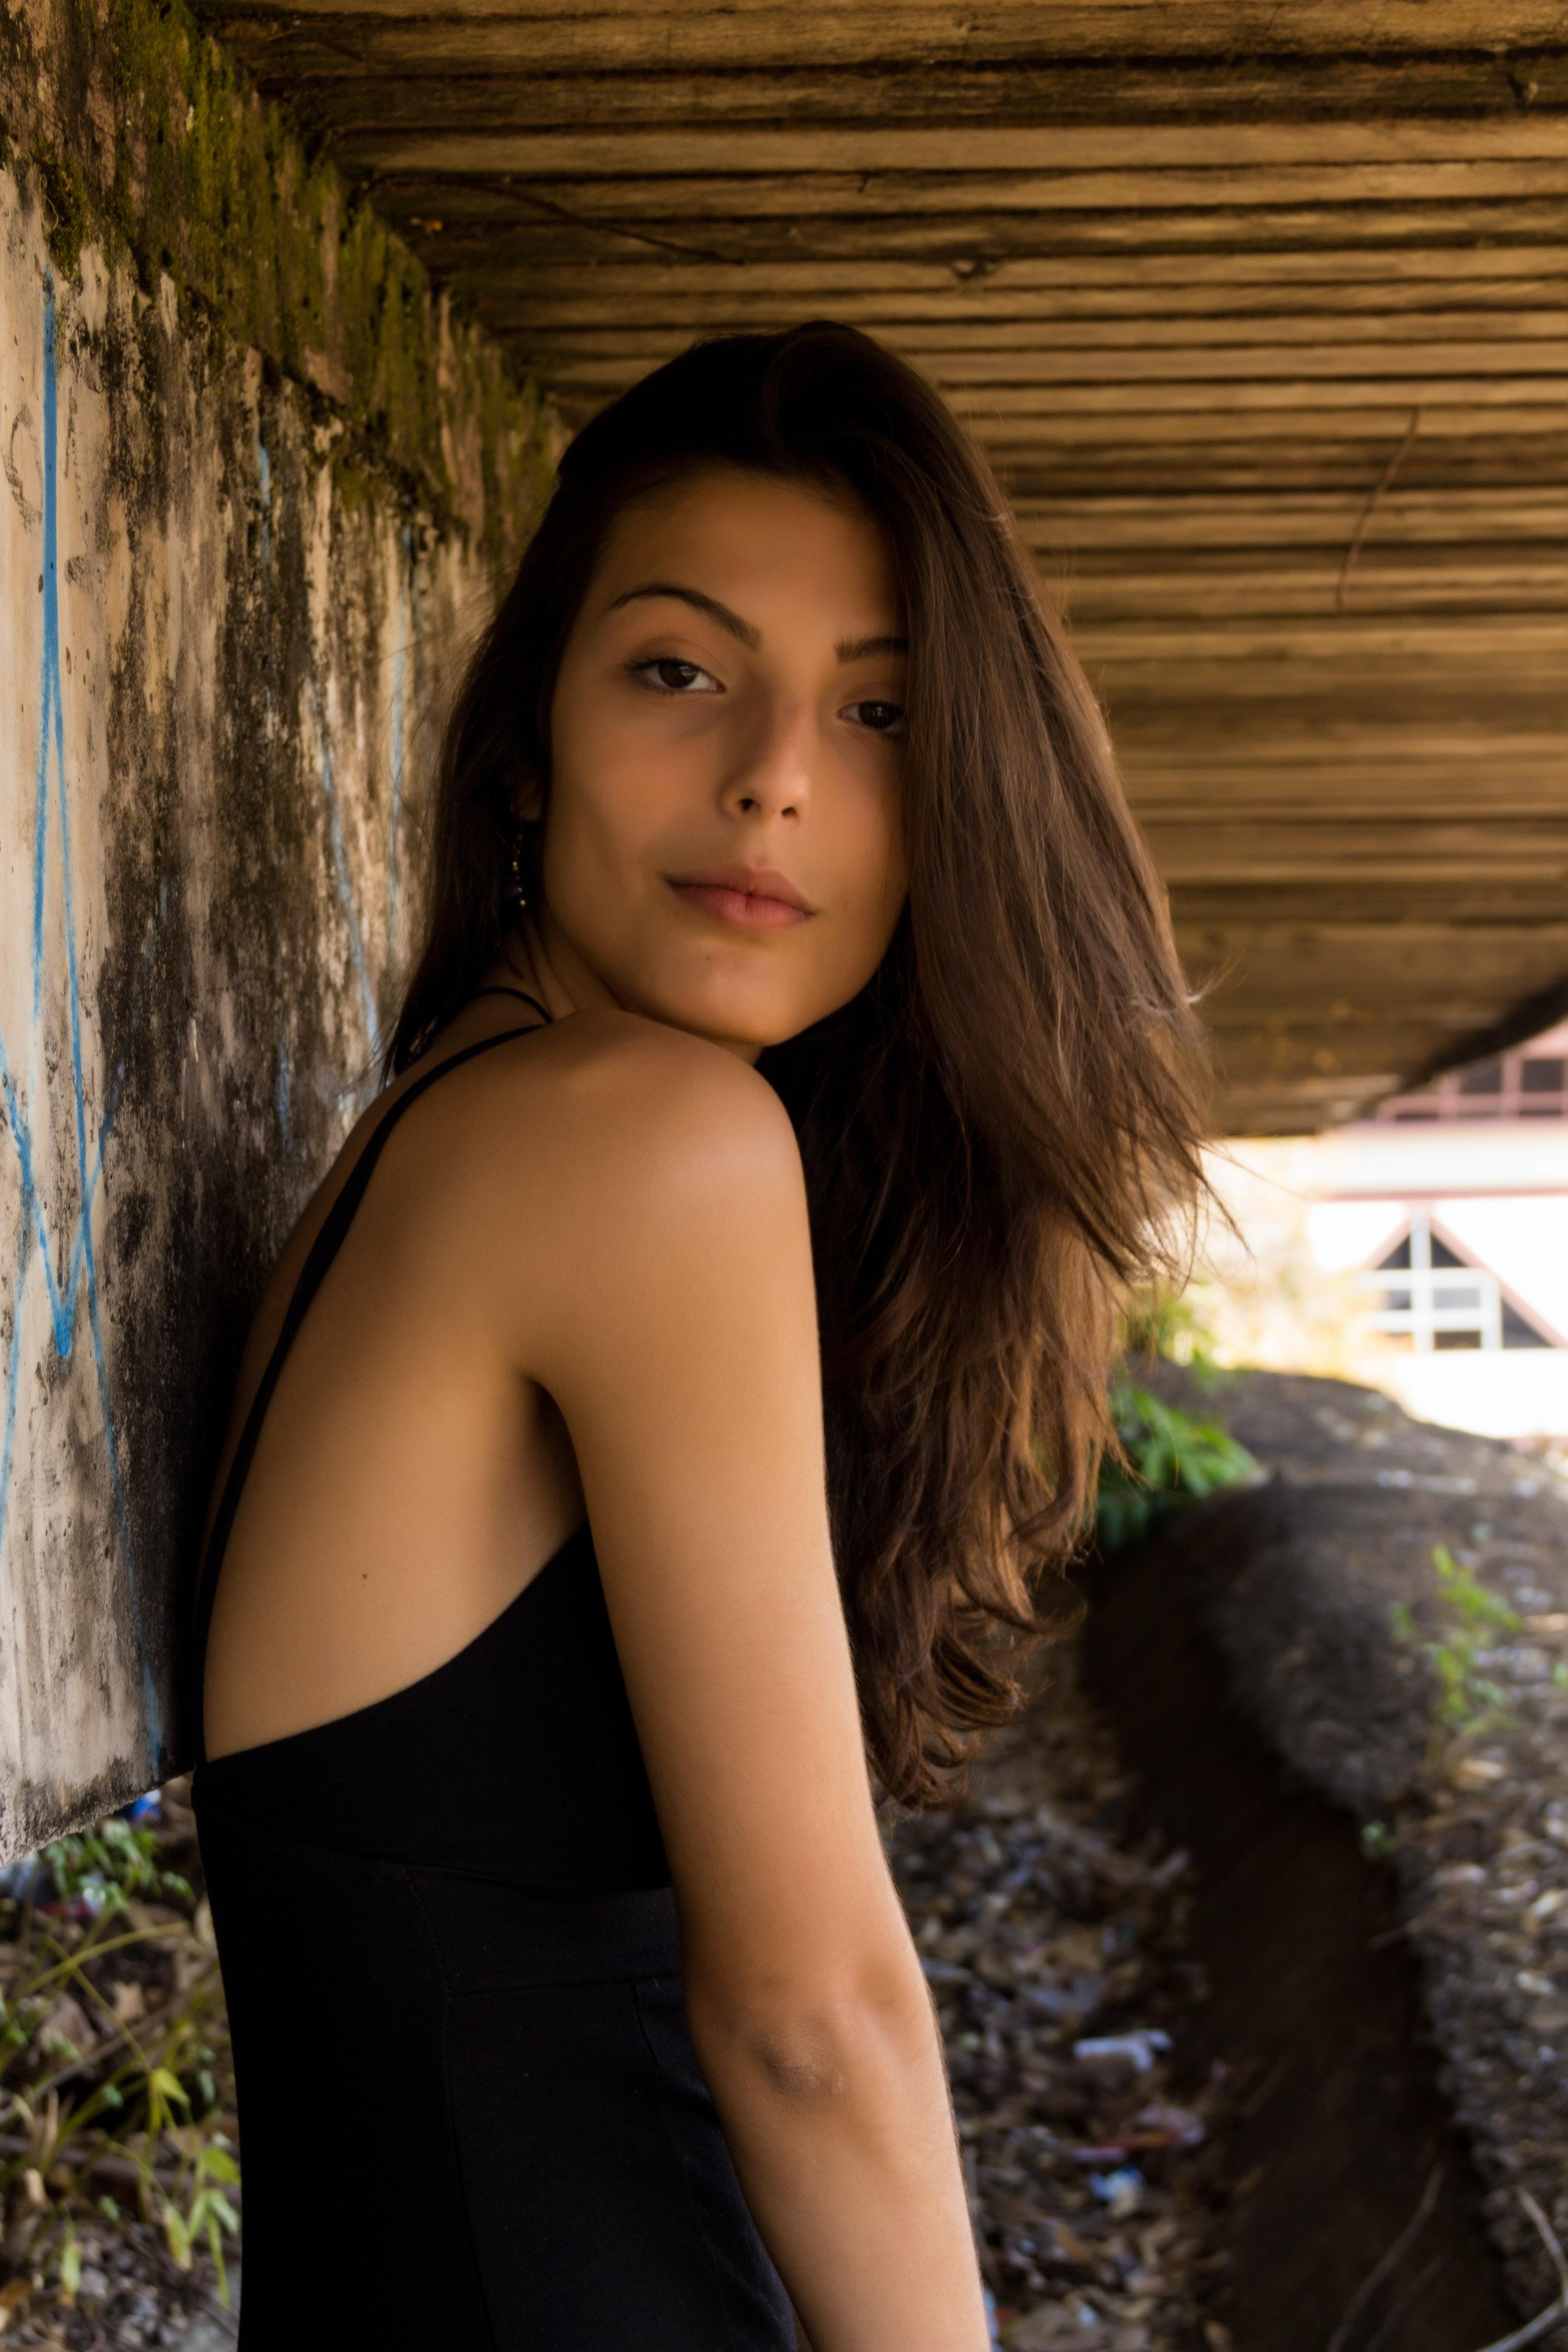 woman wearing black cami top leaning on wall under boardwalk